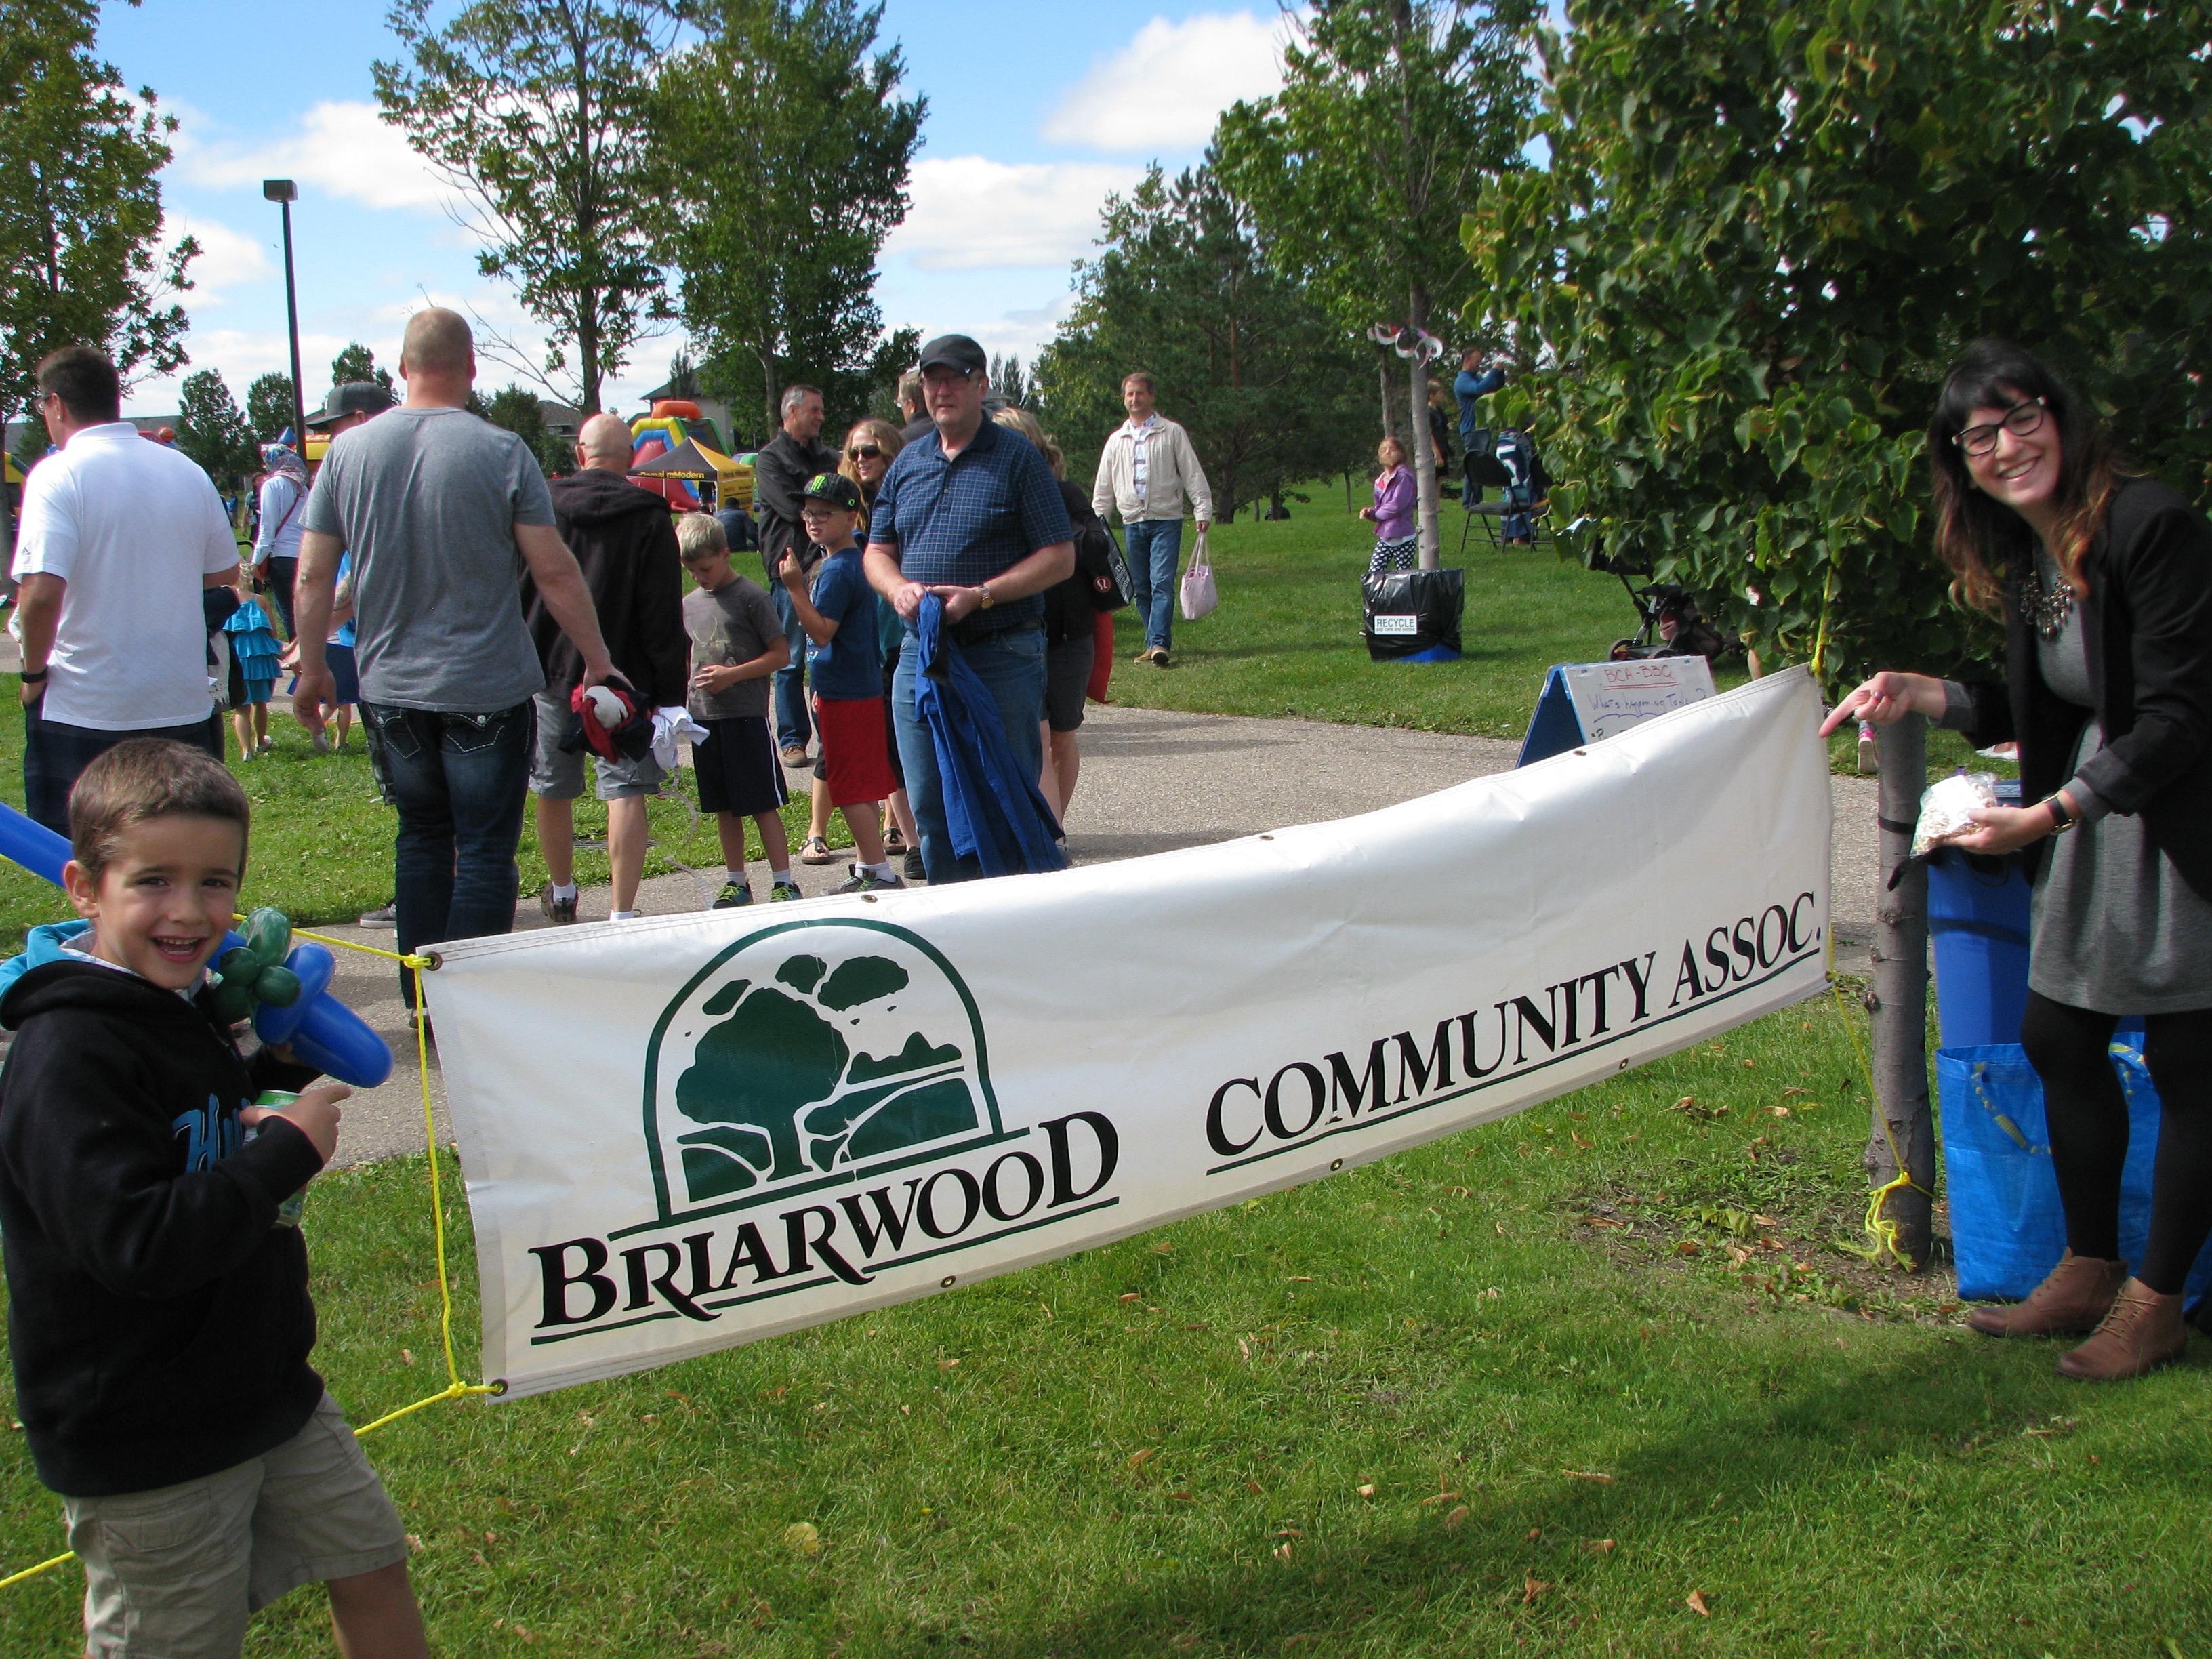 Briarwood_Annual_BBQ_-_Photo_2.jpg